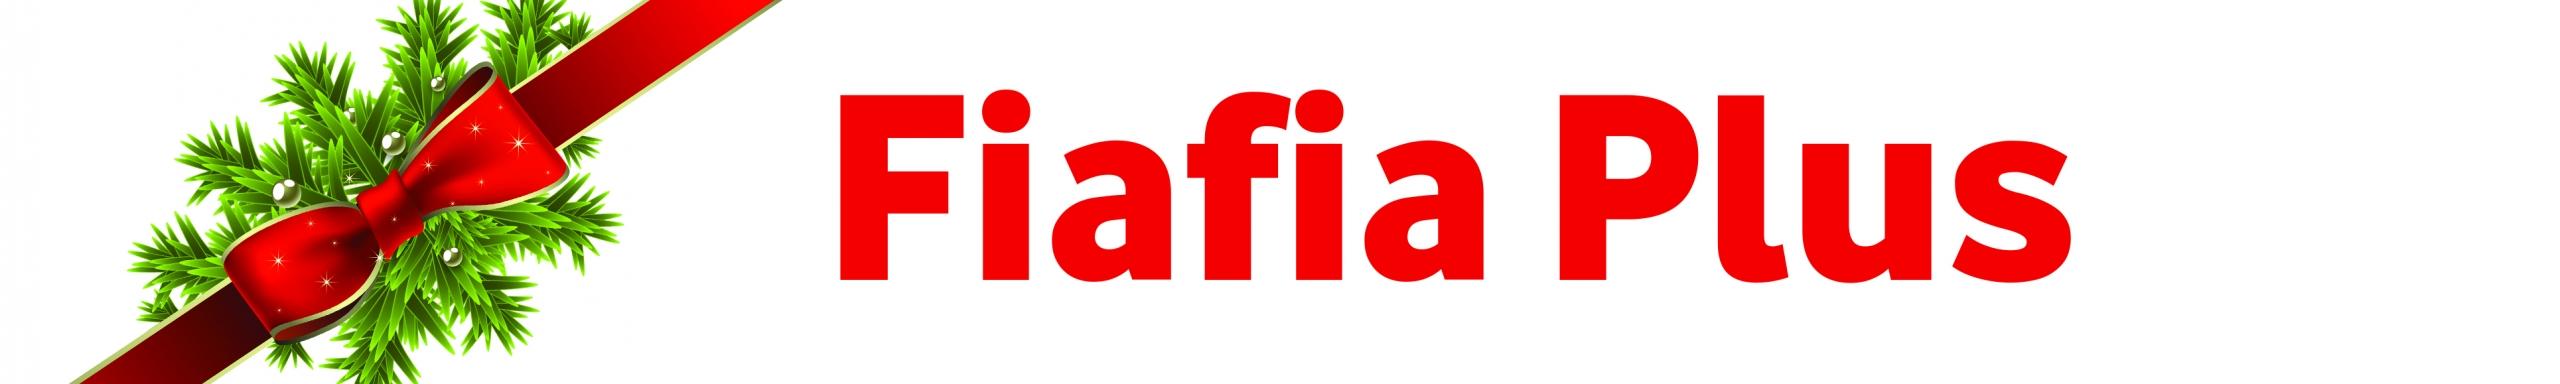 Fiafia Plus Banner